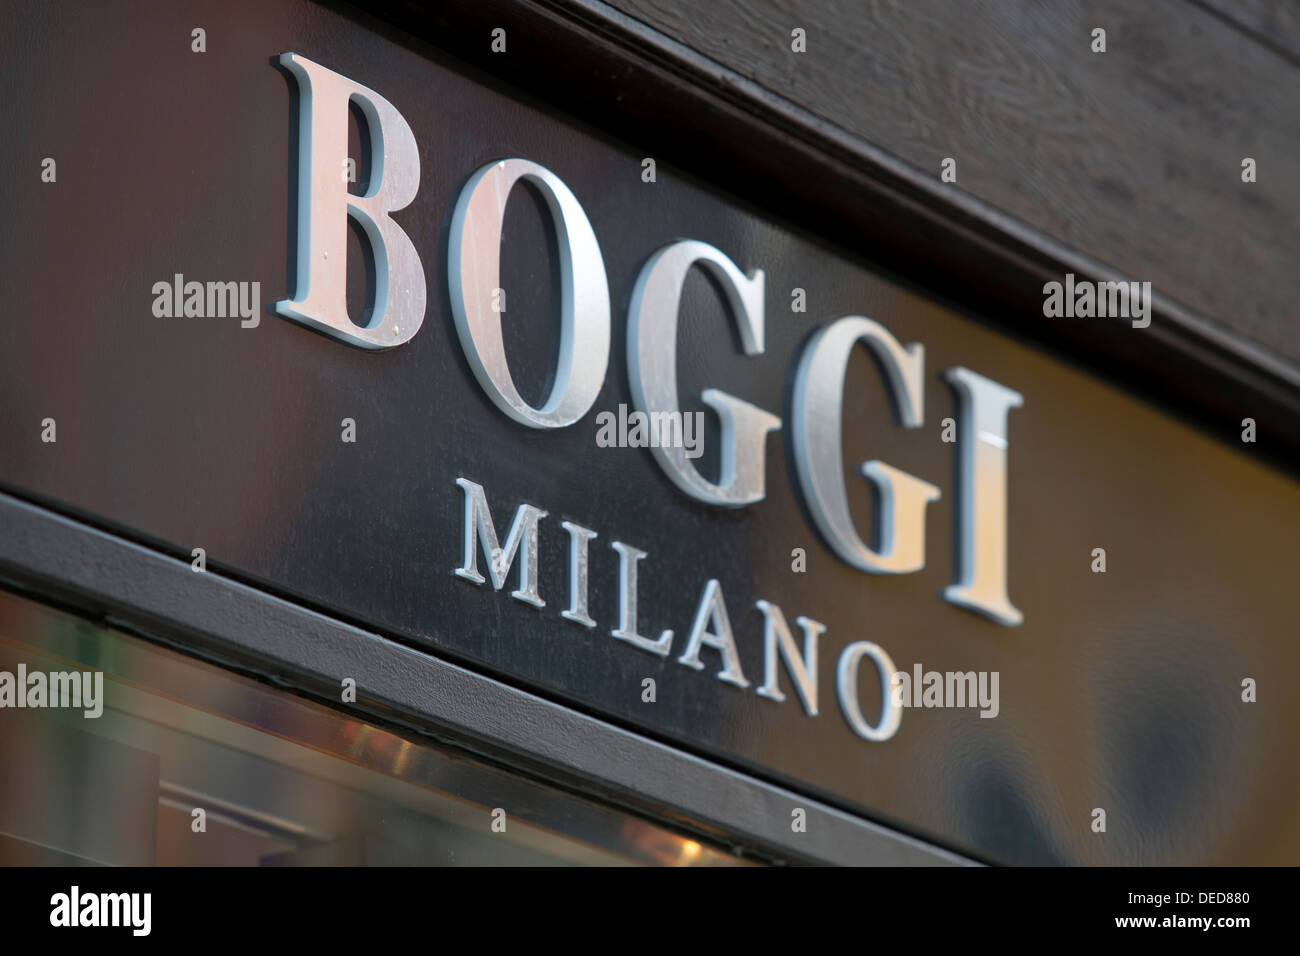 BOGGI MILANO, SHOP SIGN. VENICE, ITALY - Stock Image